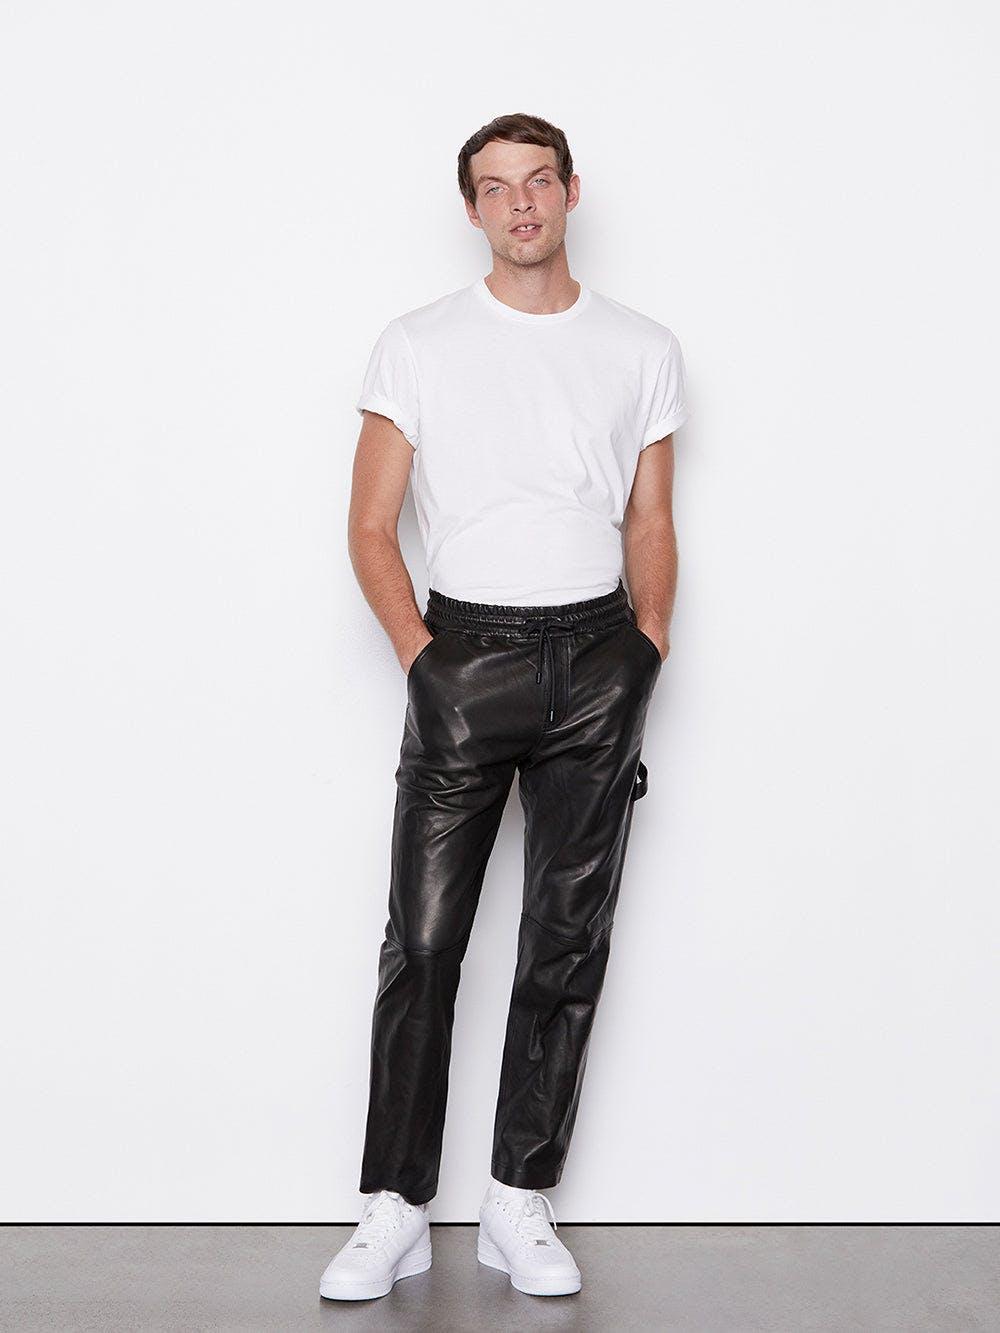 pants full body view alt:hover